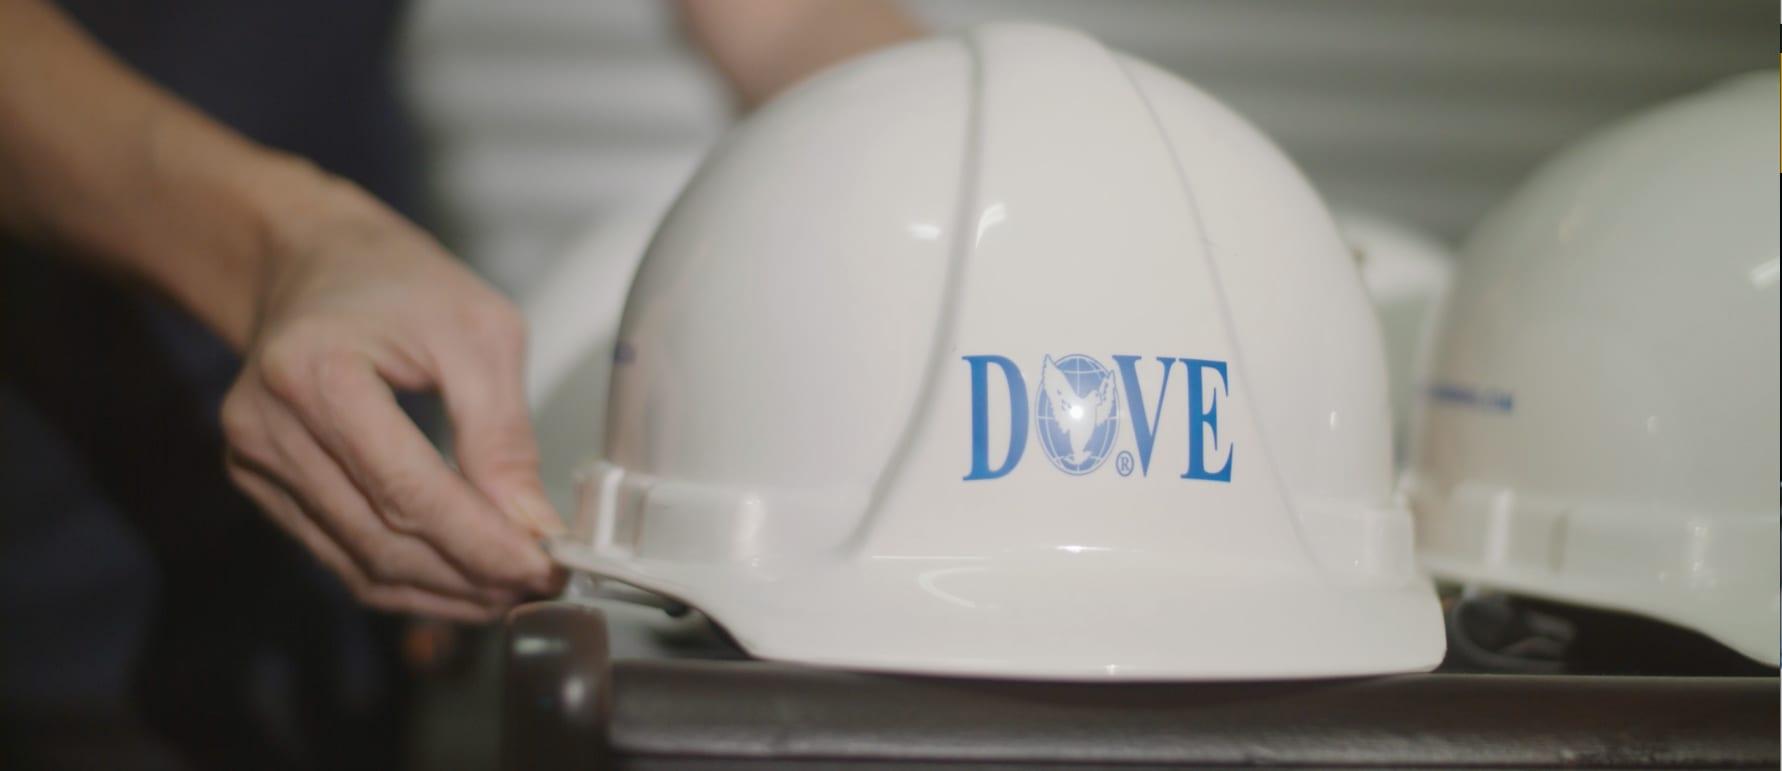 DOVE worker's white hat